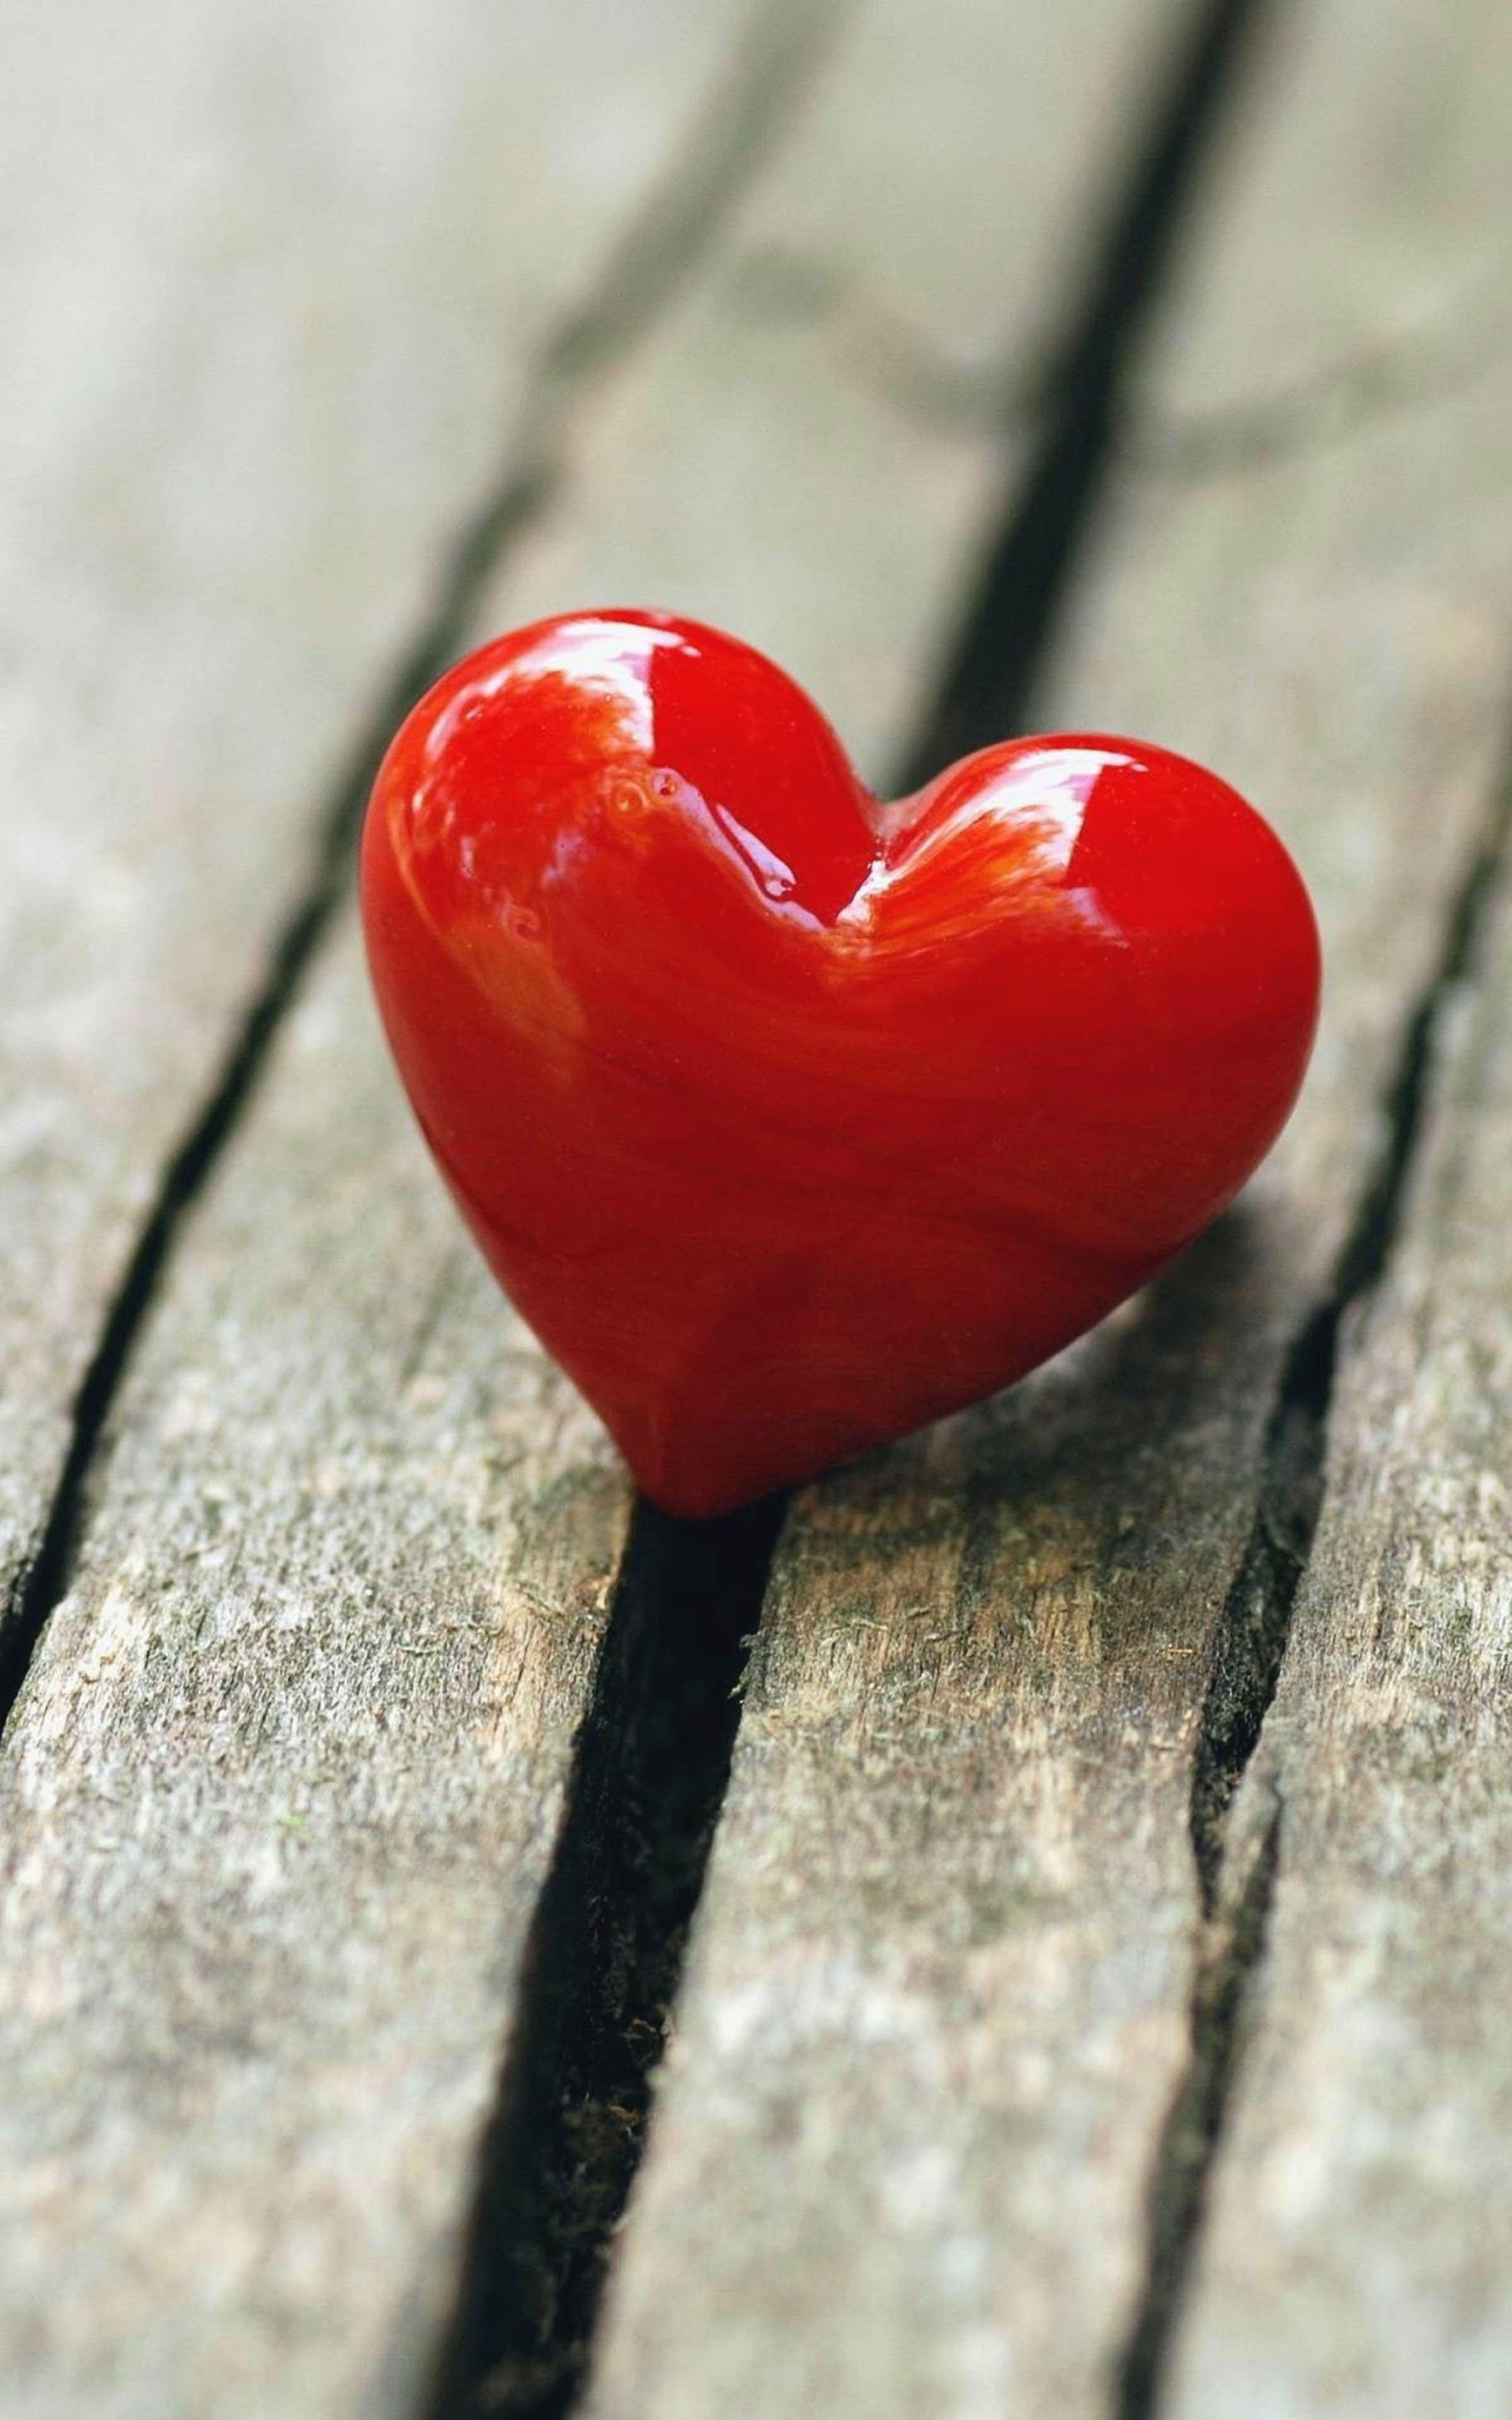 Love Wallpaper Full Hd Best Love Wallpapers For Android Cinta Wallpaper Percintaan Cinta